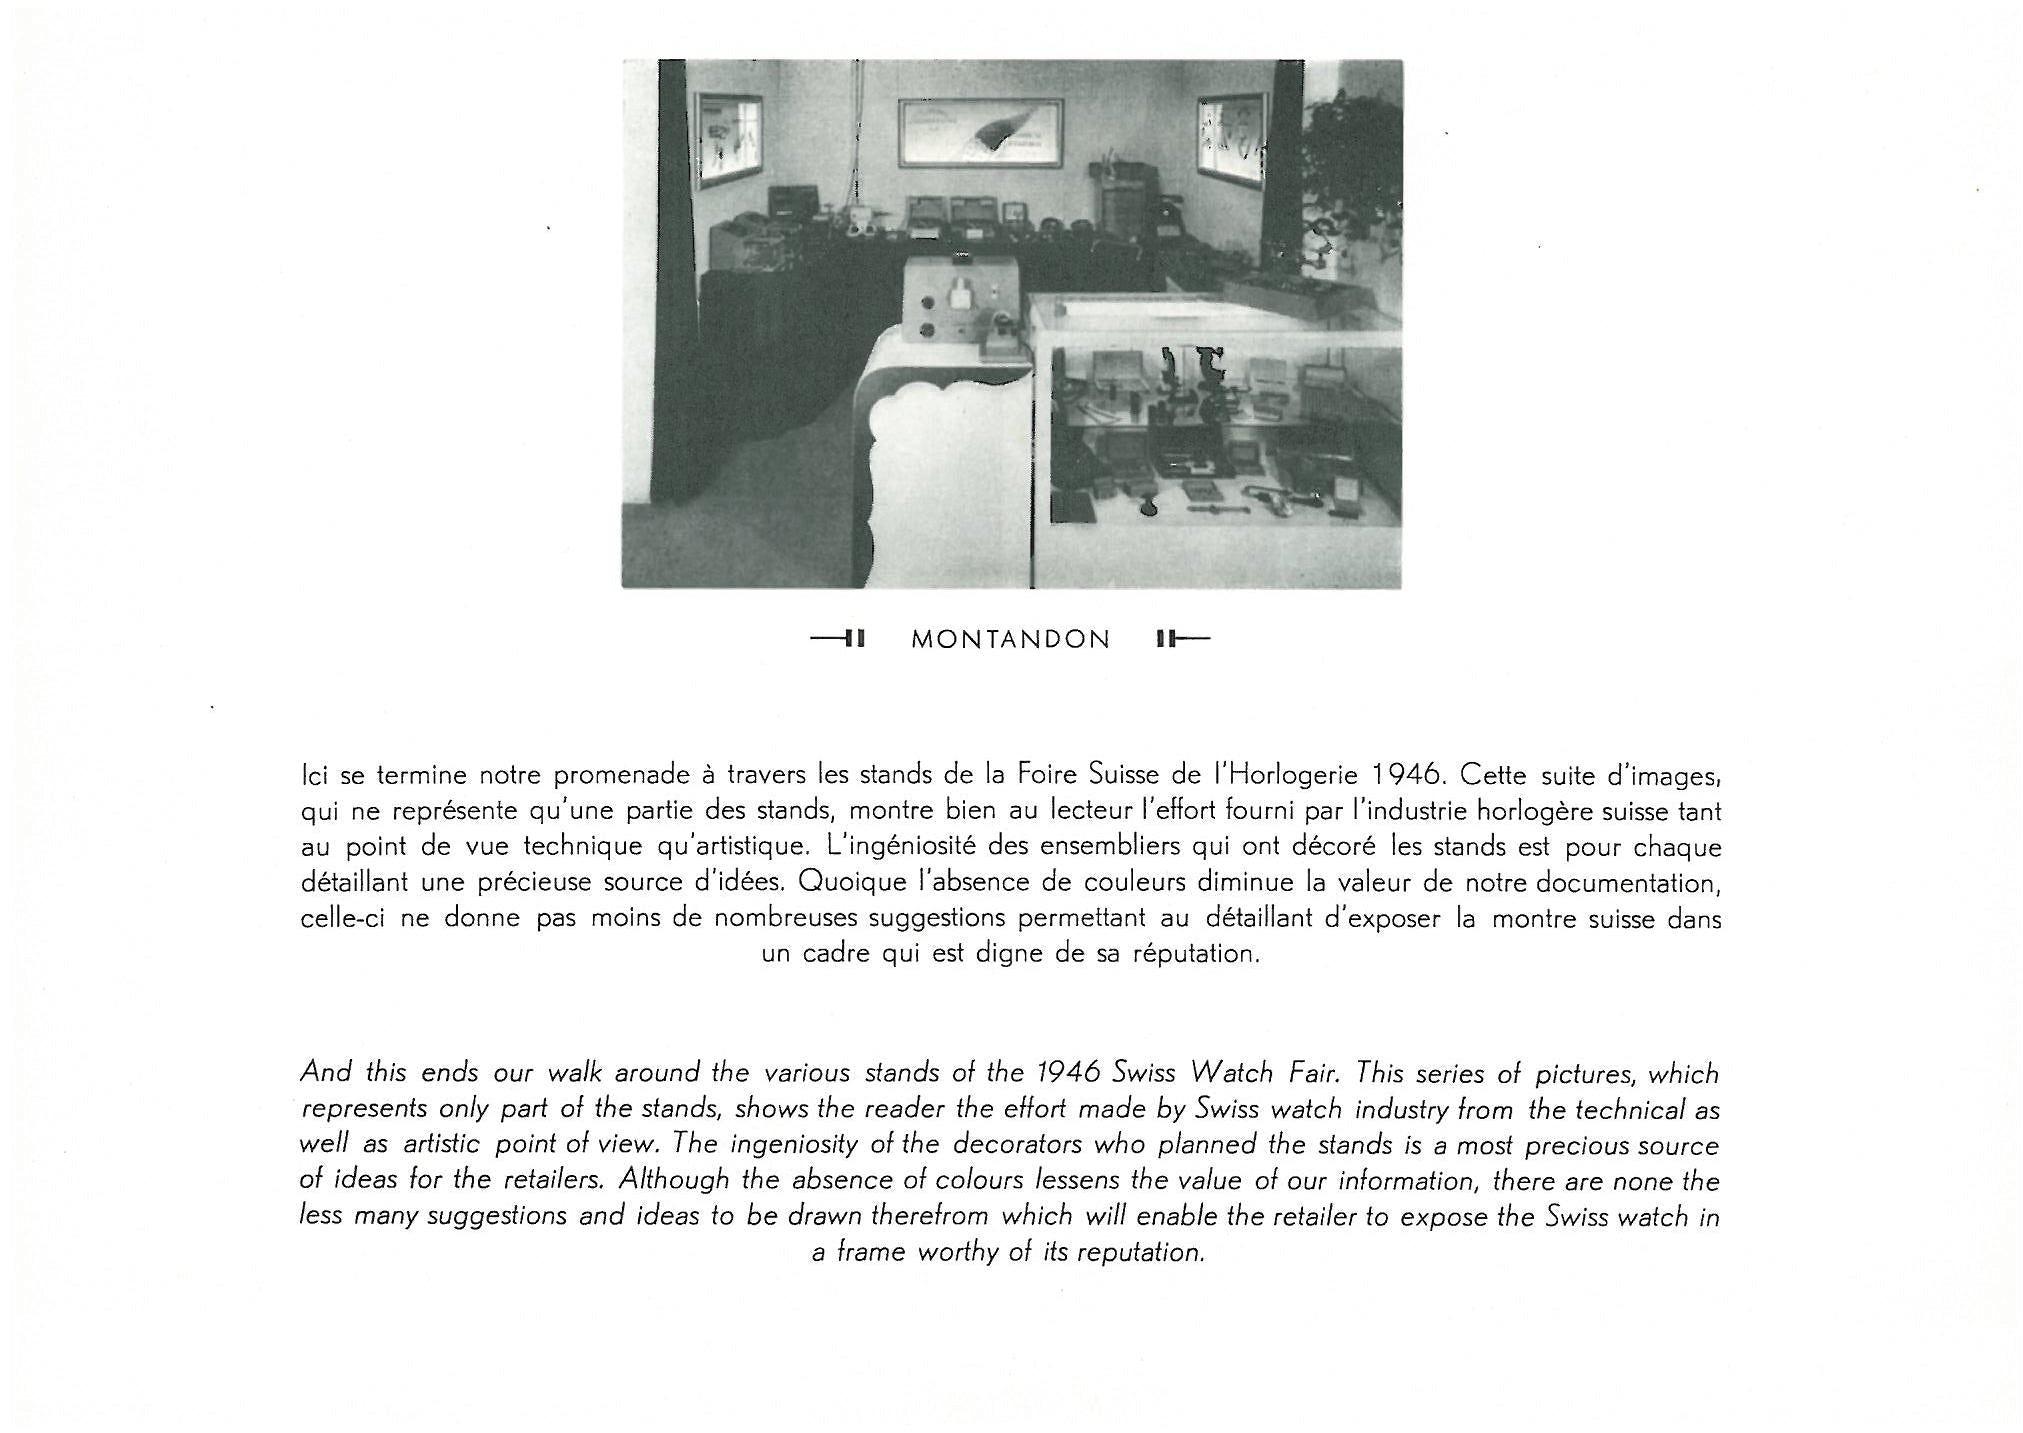 Baselworld 1946